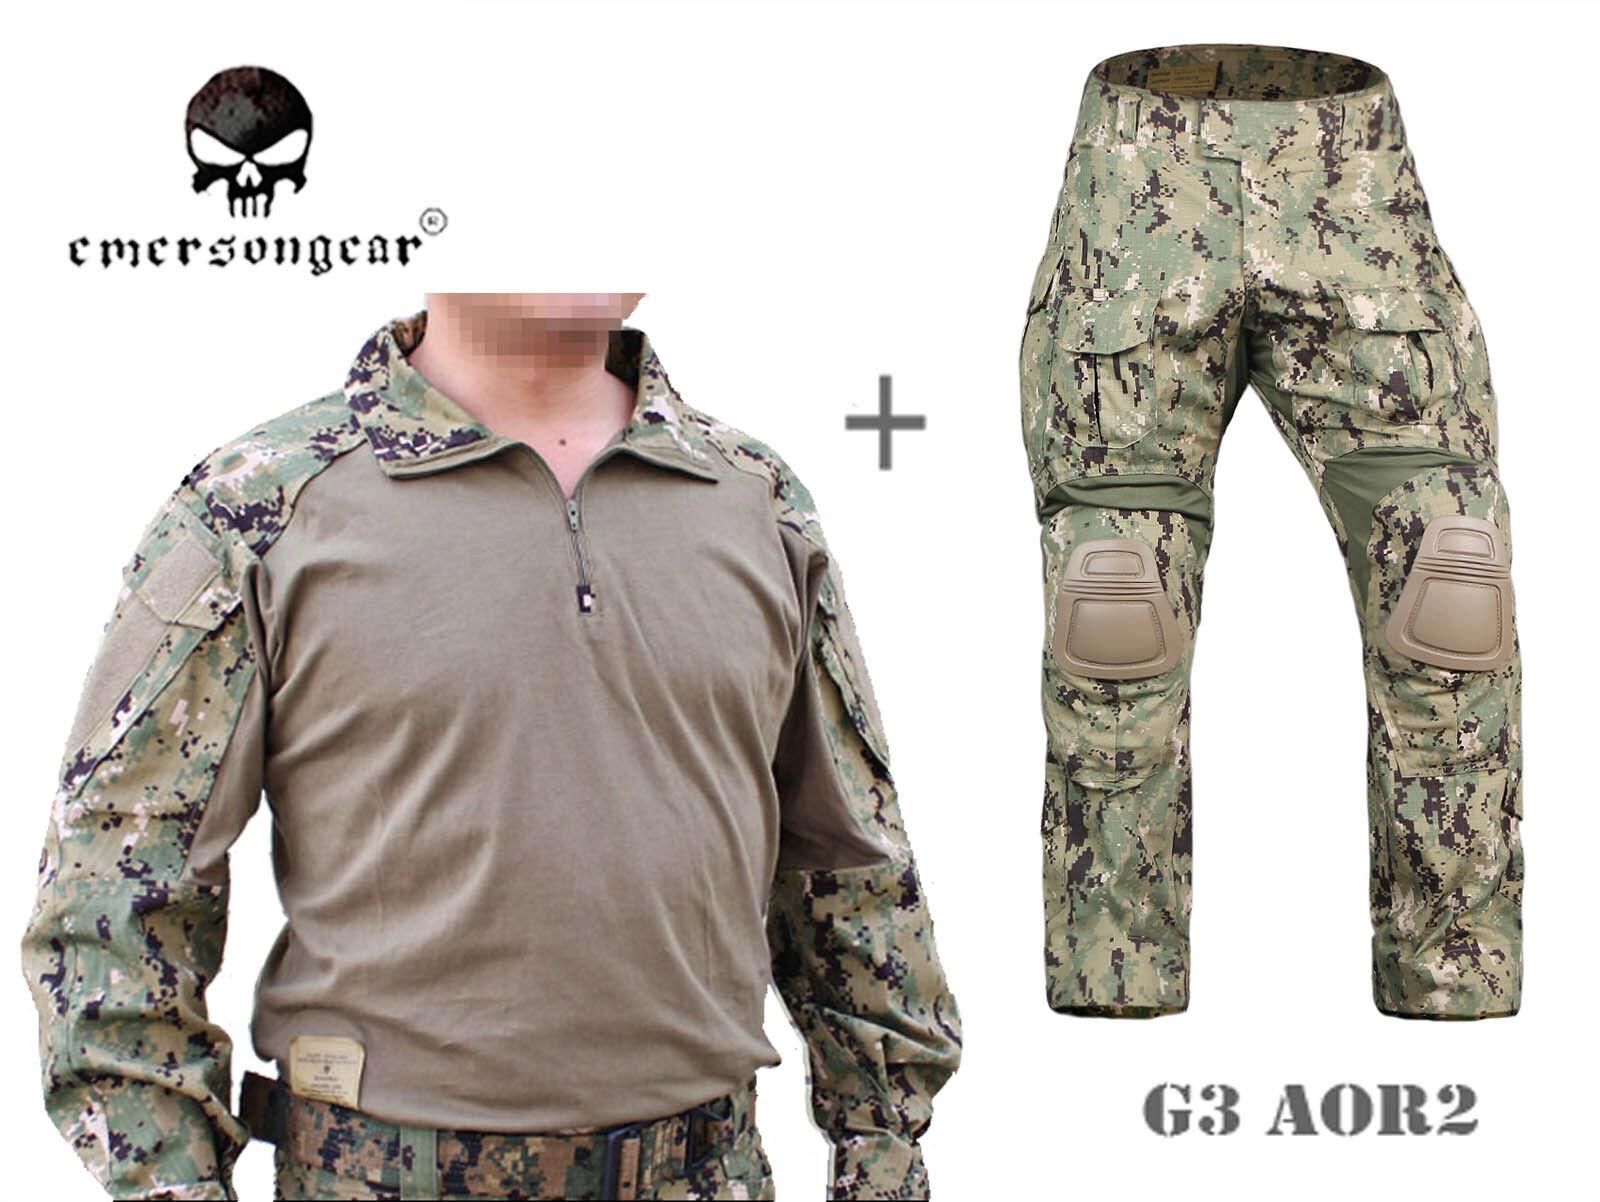 Airsoft Army Tactical Uniform Emerson Combat G3 Uniform Shirt Pants AOR2